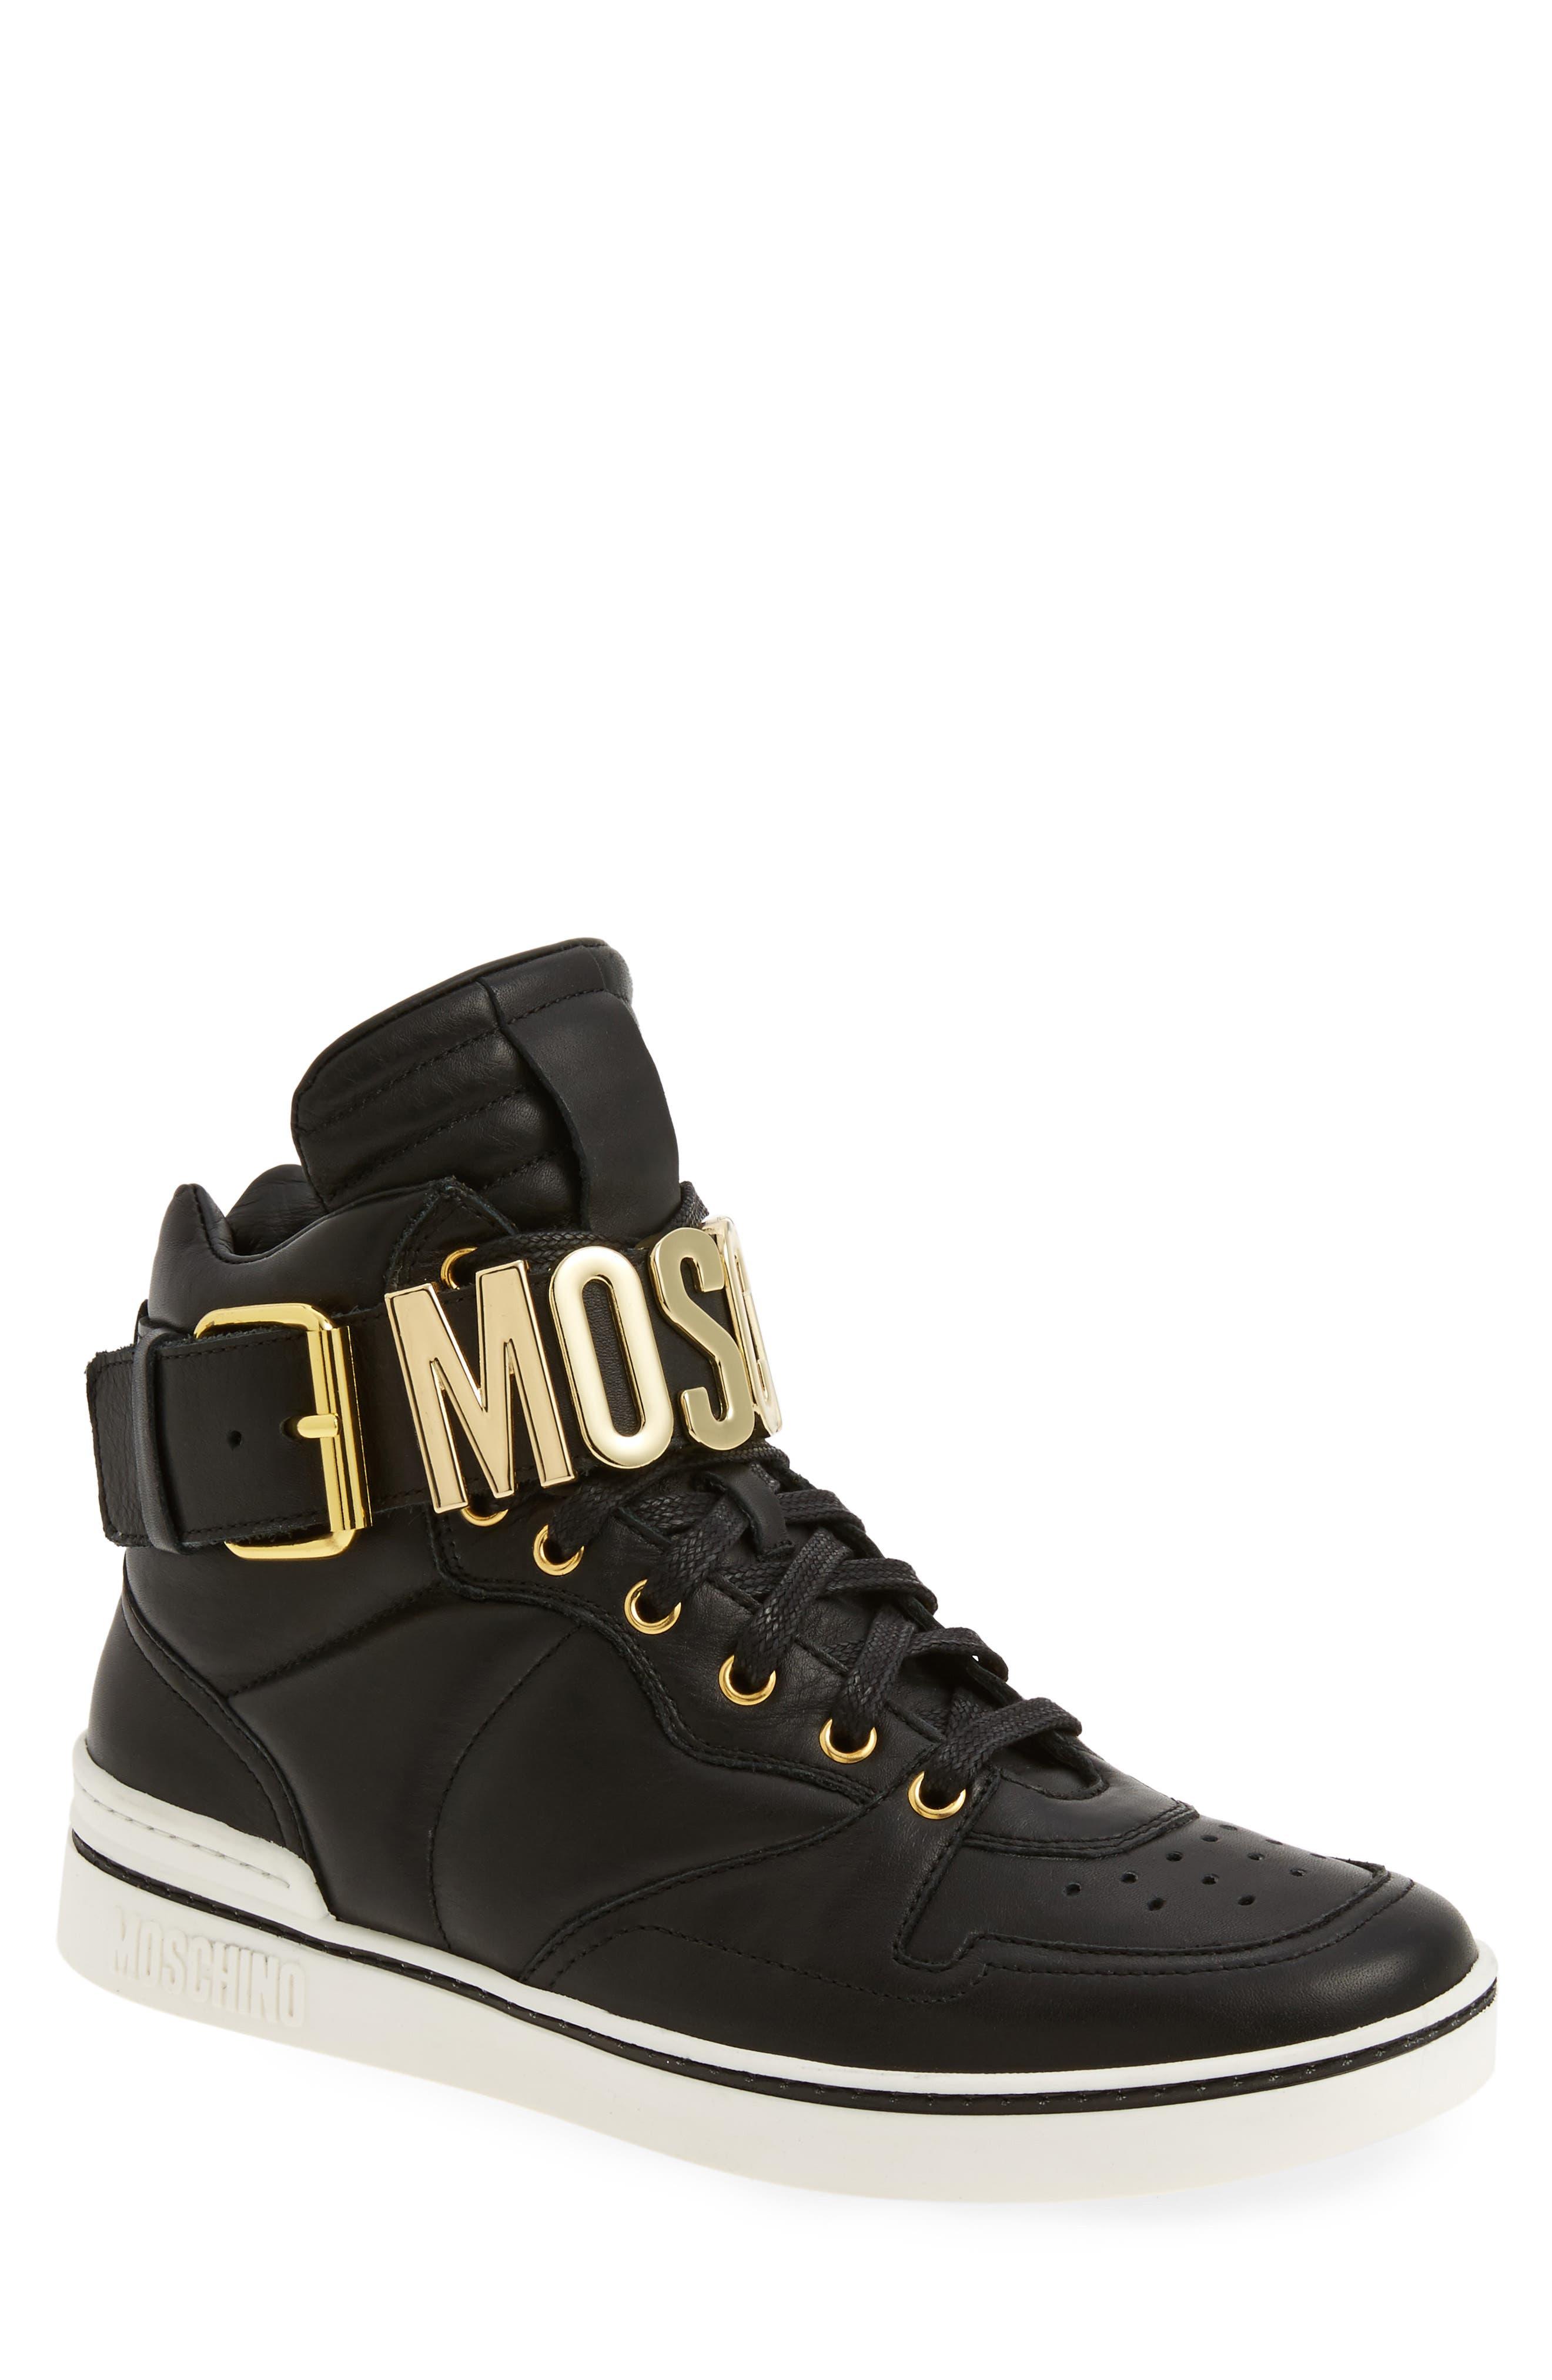 High Top Sneaker,                         Main,                         color, 001